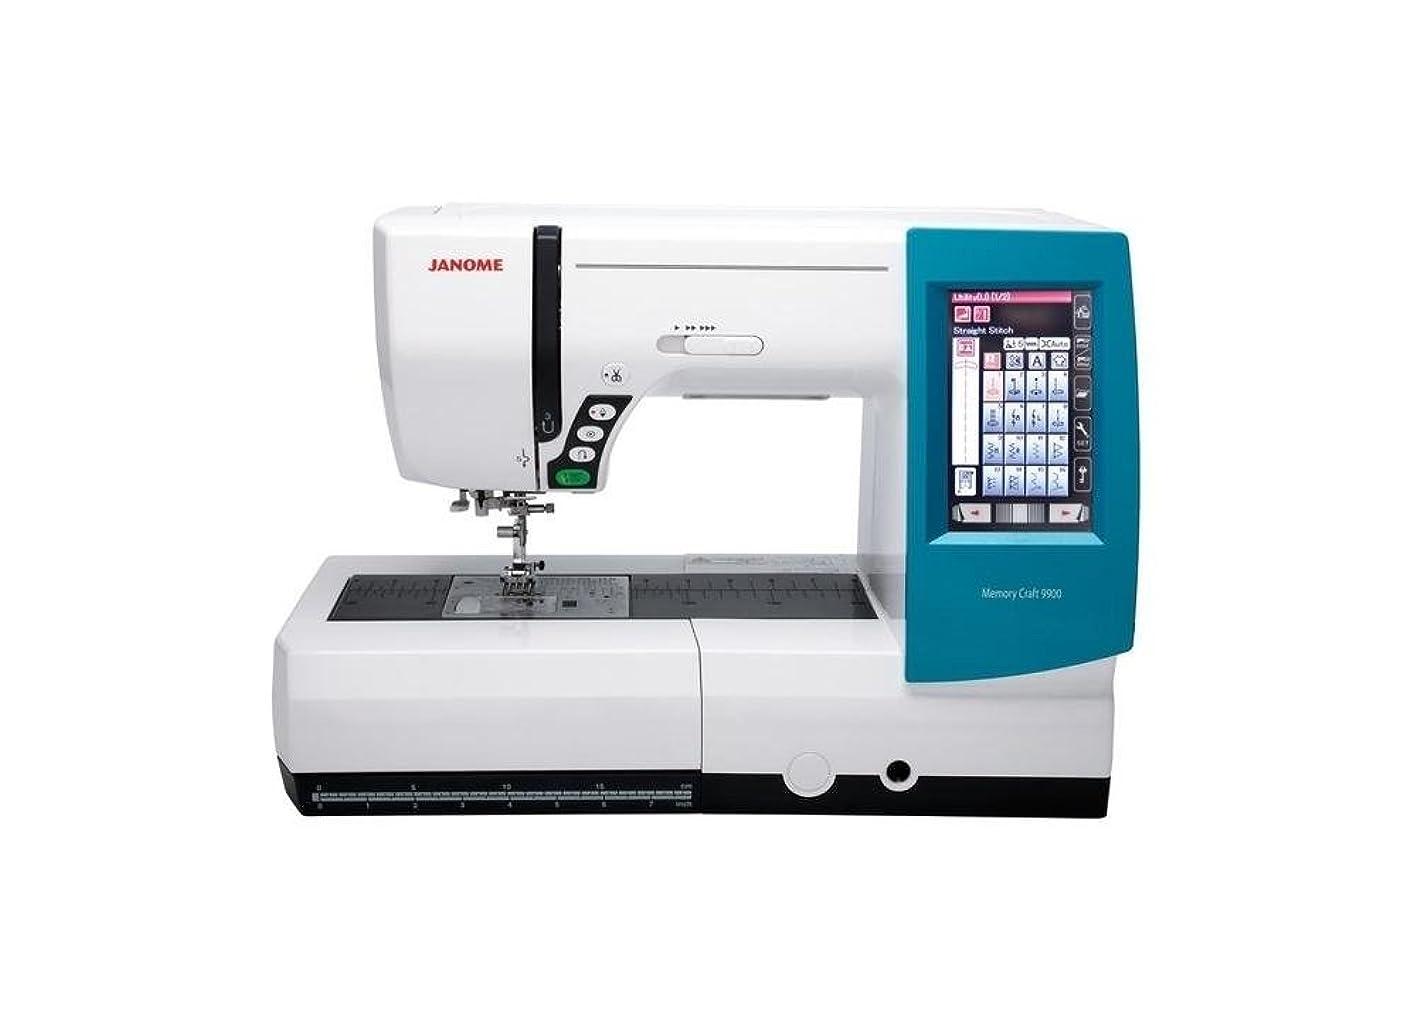 Memory Craft 9900 Sewing & Embroidery Machine jysqbbndlqk897